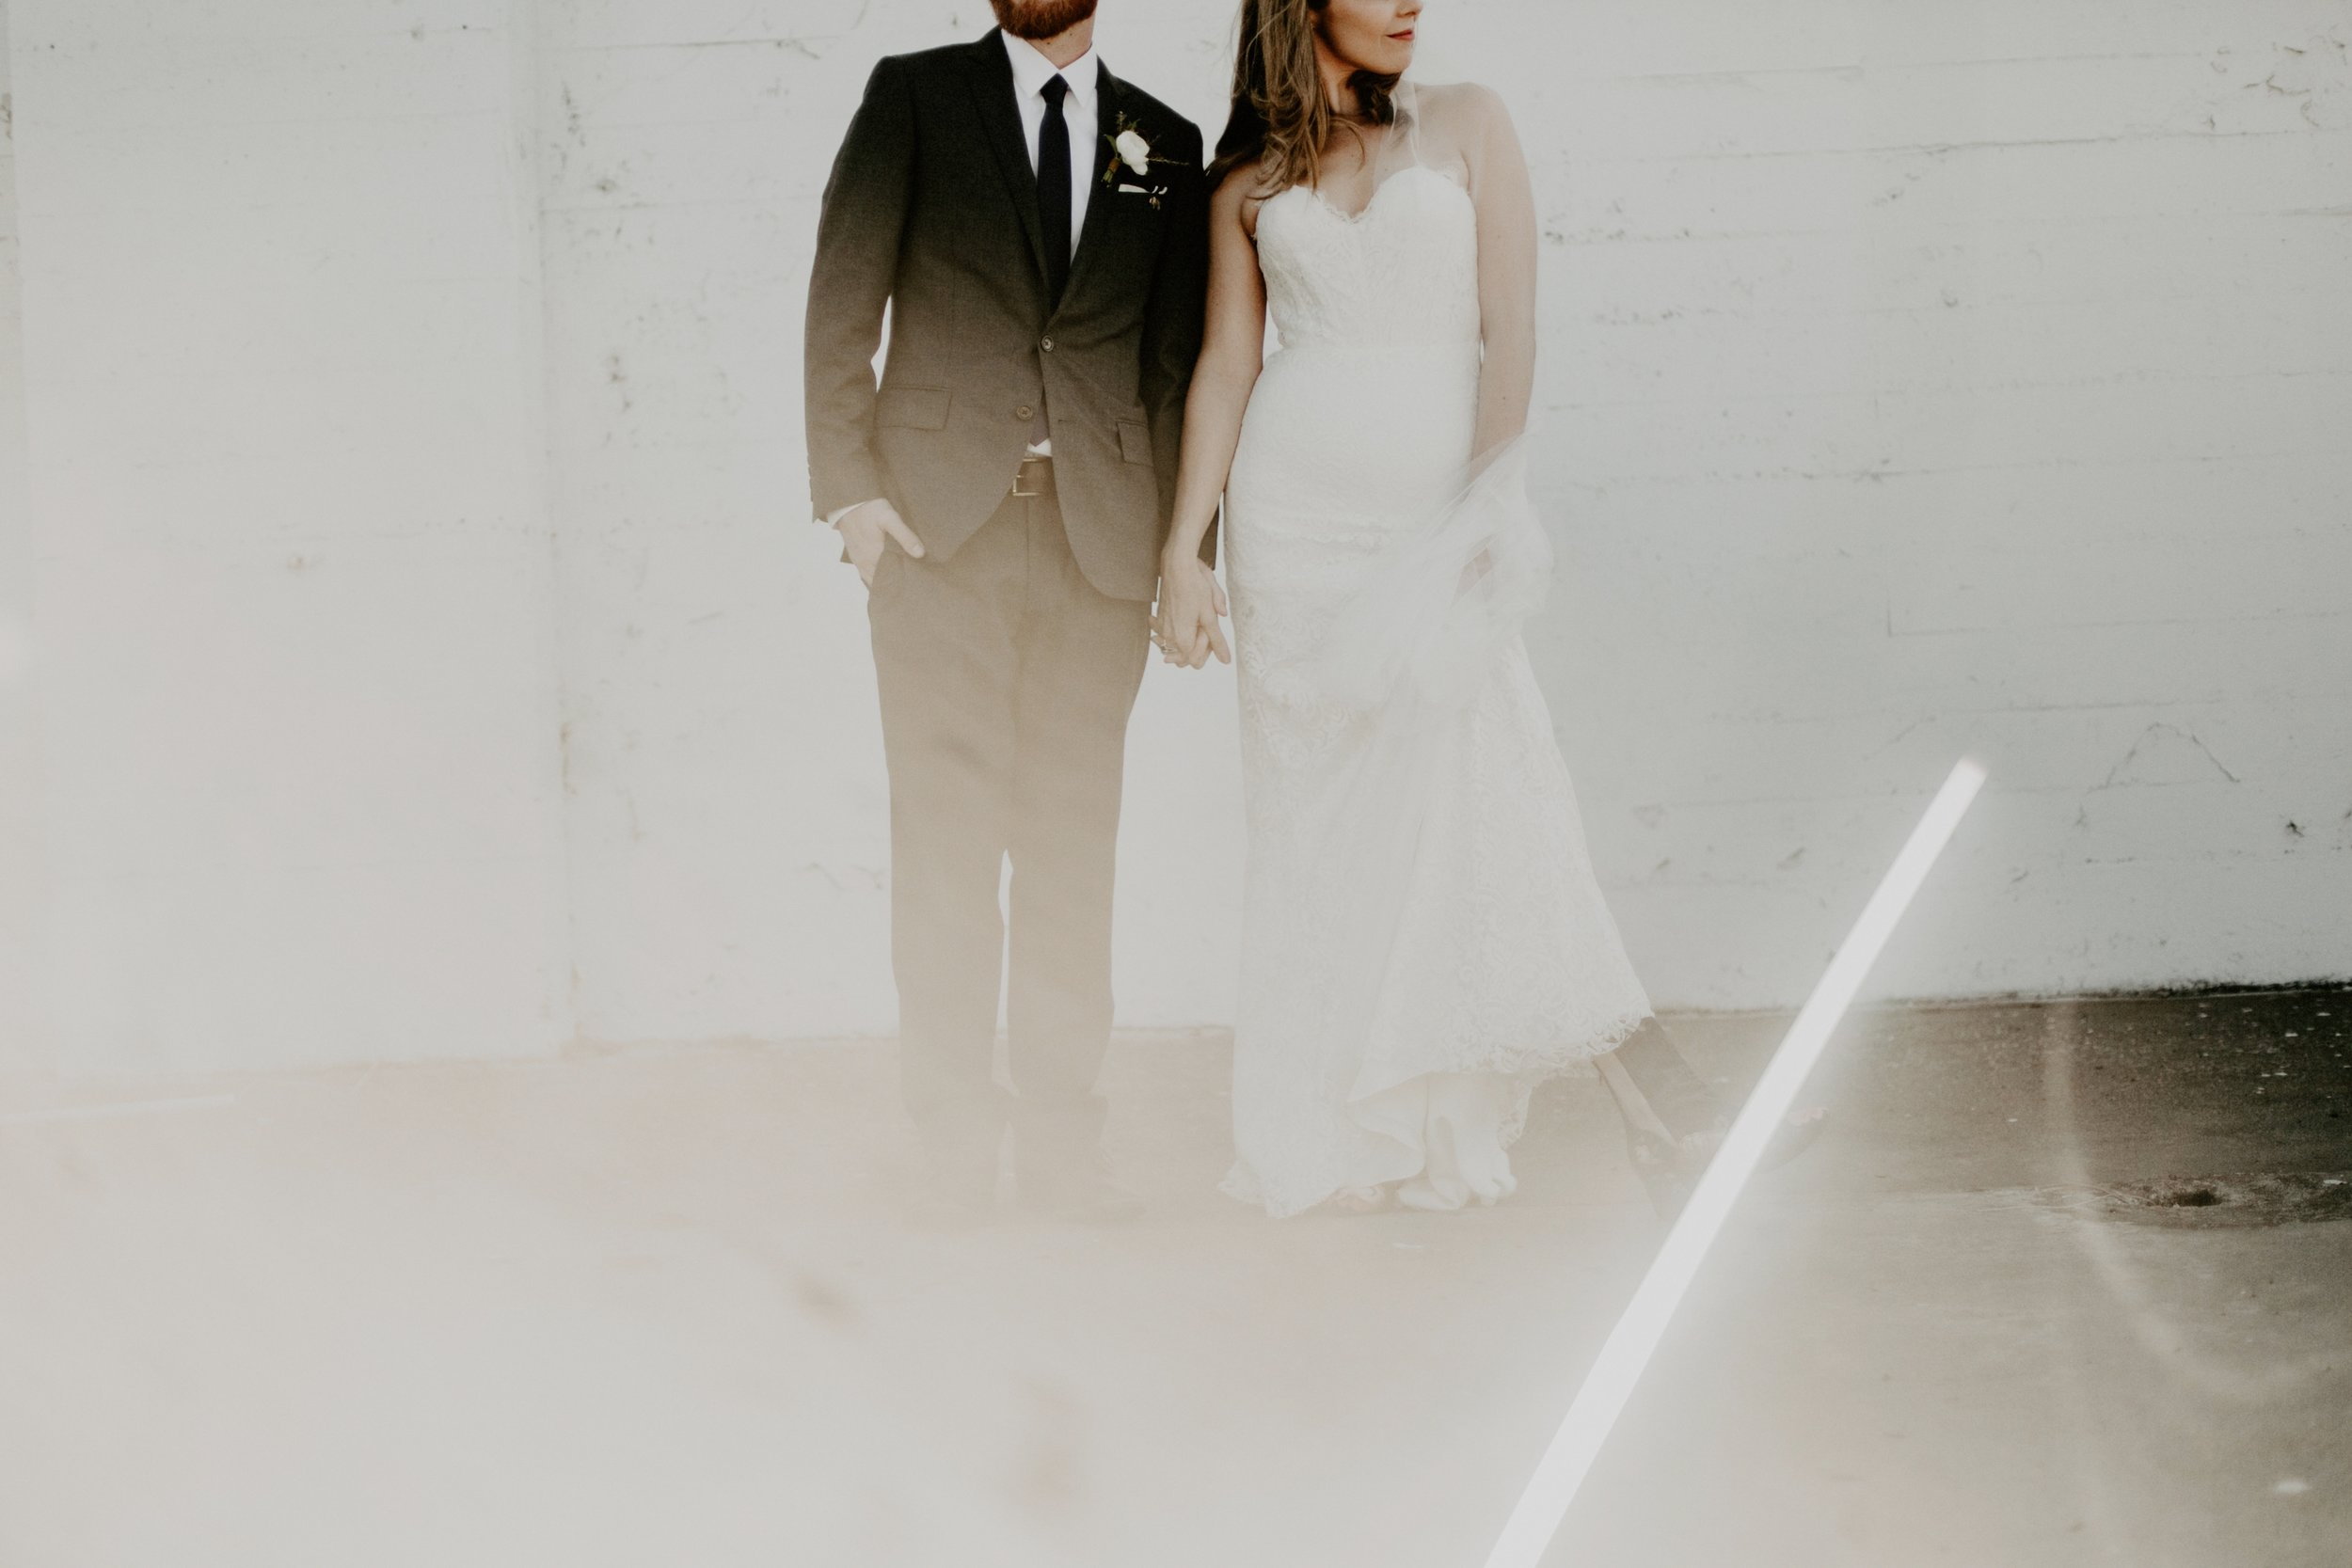 20's Inspired Seaside Wedding // Jessica + Patrick